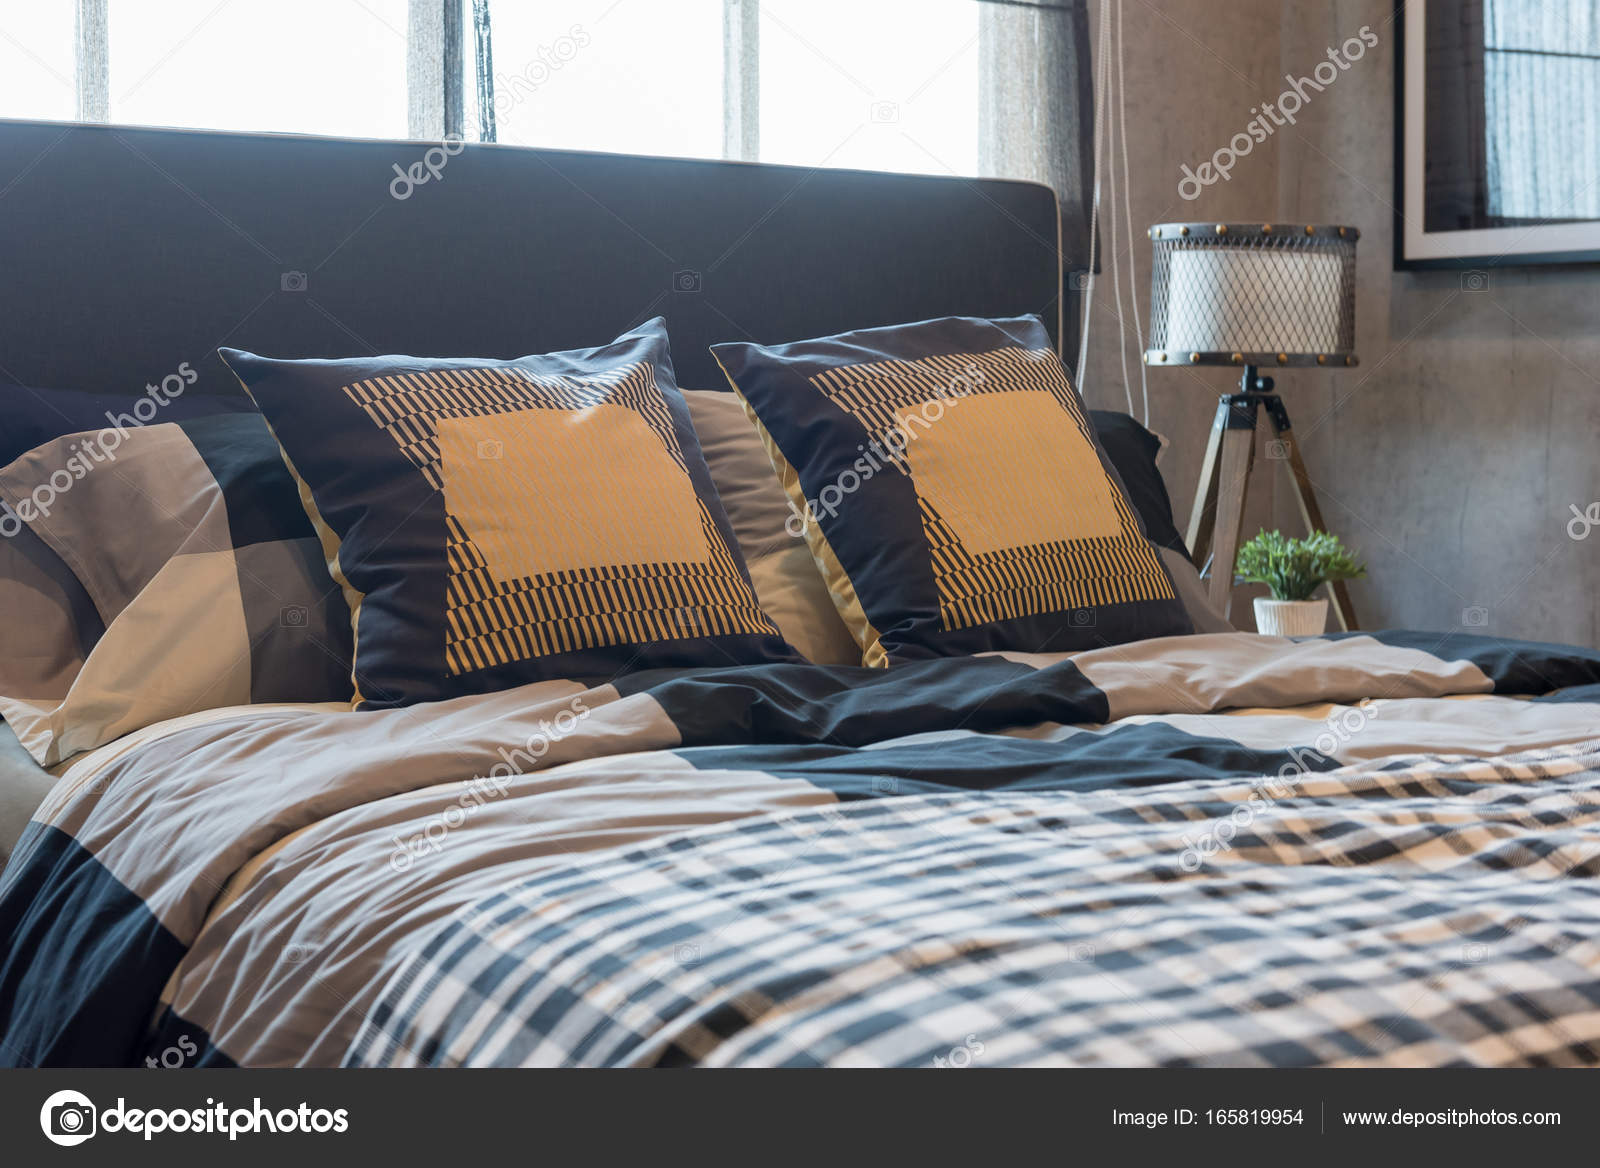 Moderne slaapkamer stijl u2014 stockfoto © khongkitwiriyachan #165819954